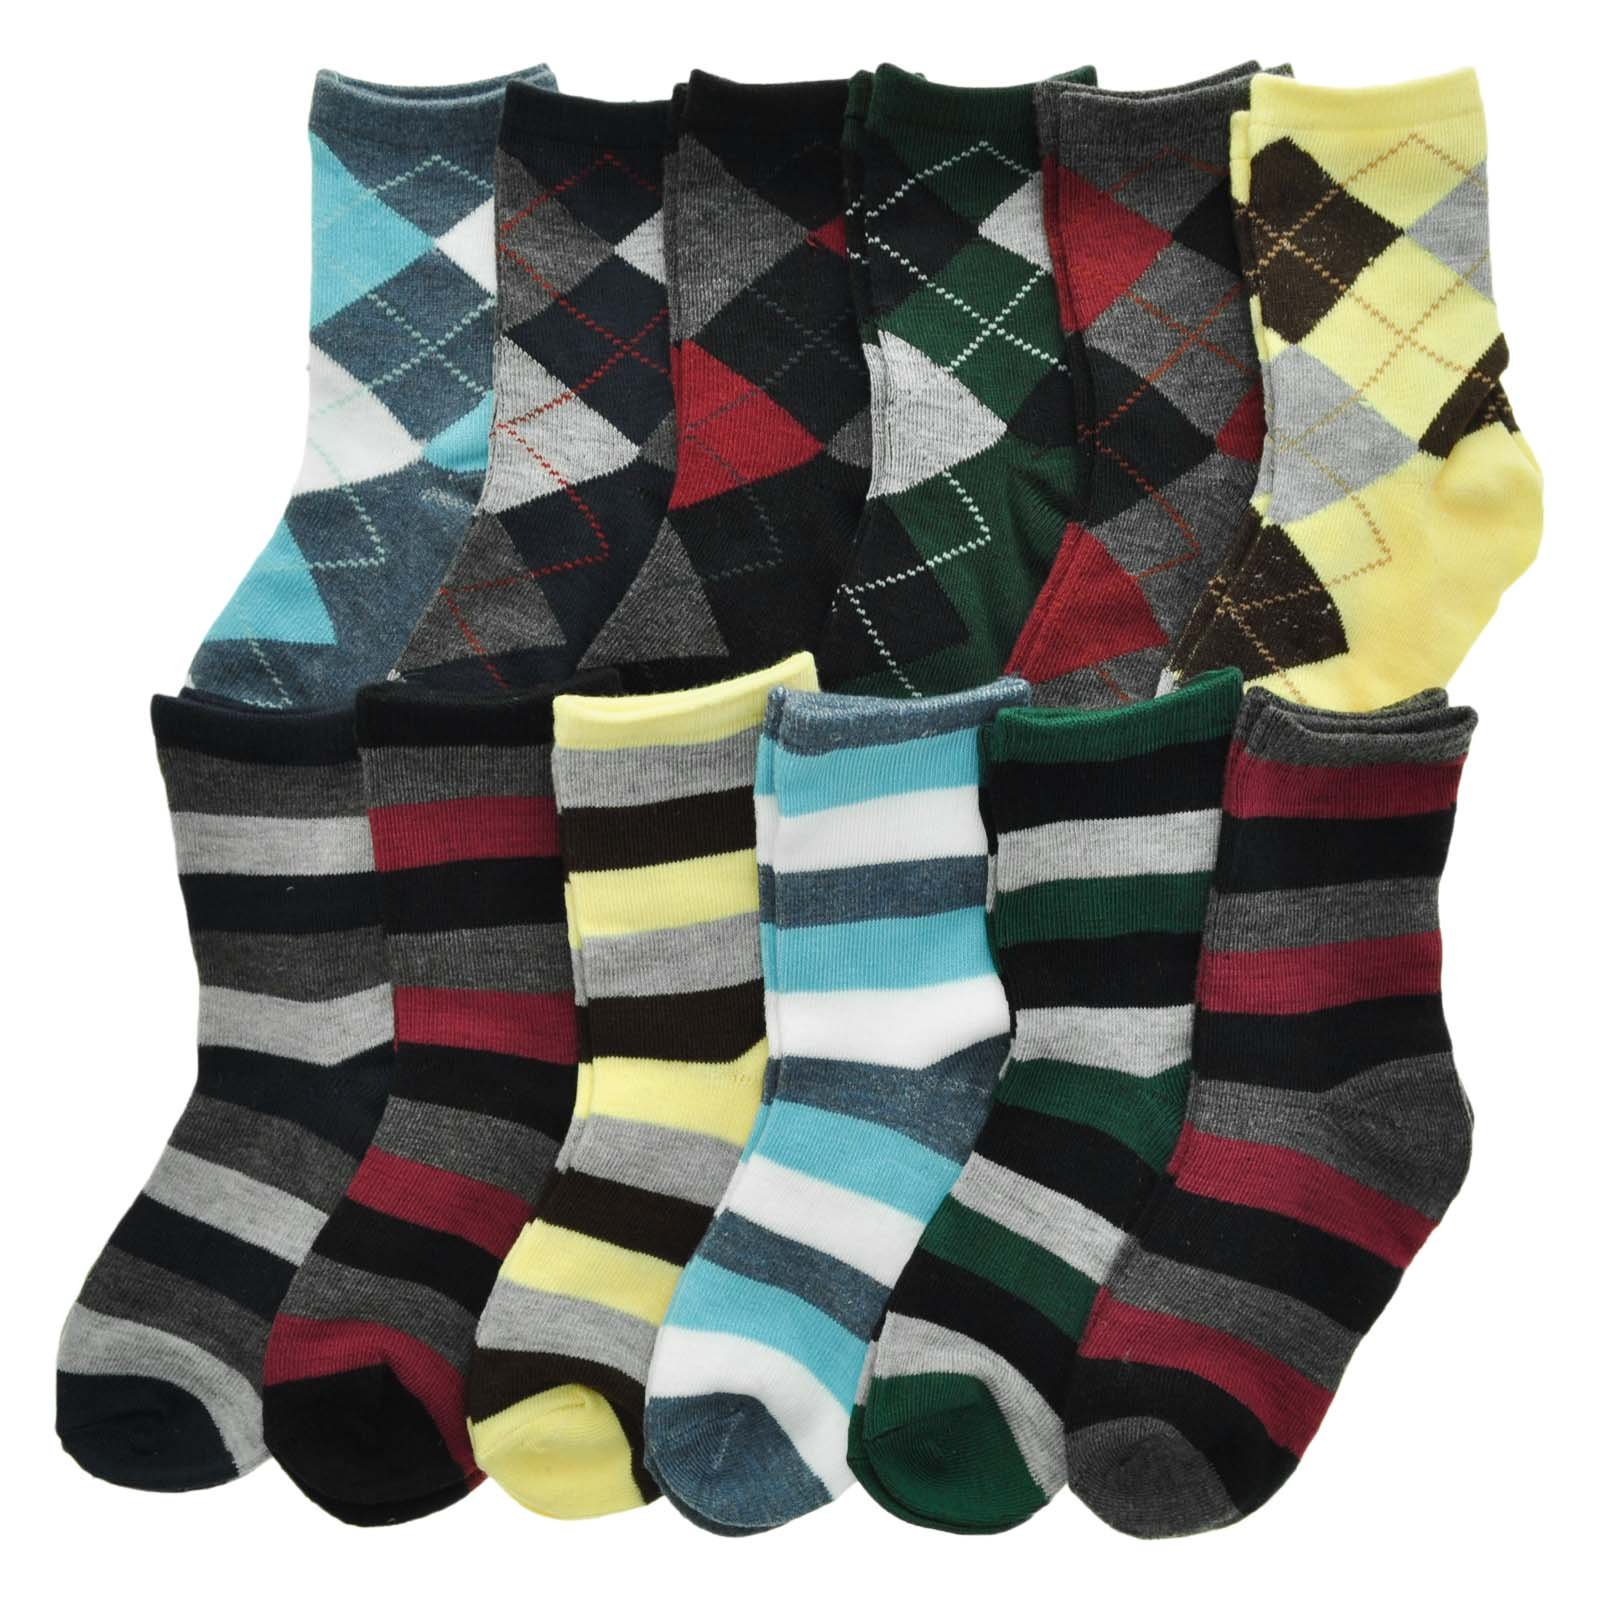 Swan Boys Kid's Novelty Crew Socks (12-Pairs), 357_B_STRIPE_M